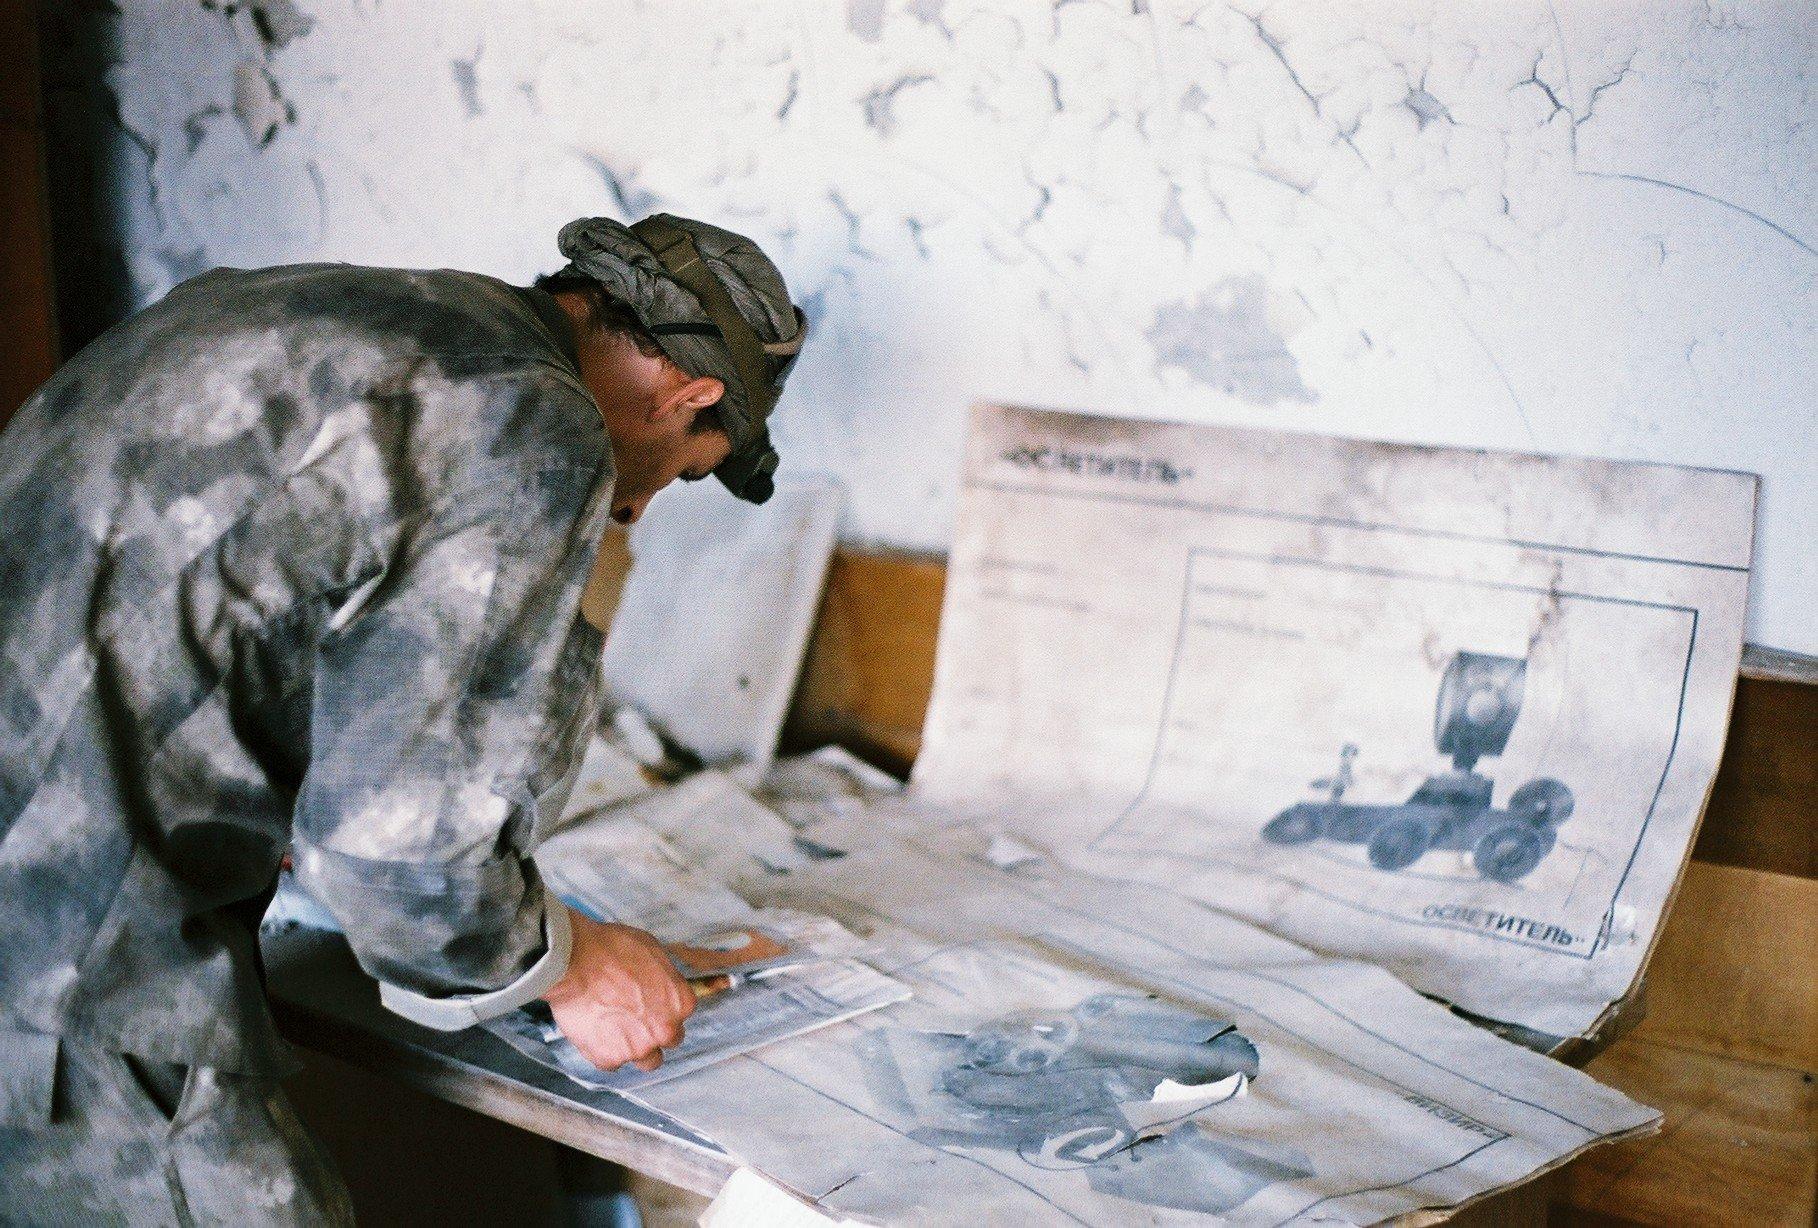 snaeking-into-chernobyl17 SNEAKING INTO CHERNOBYL